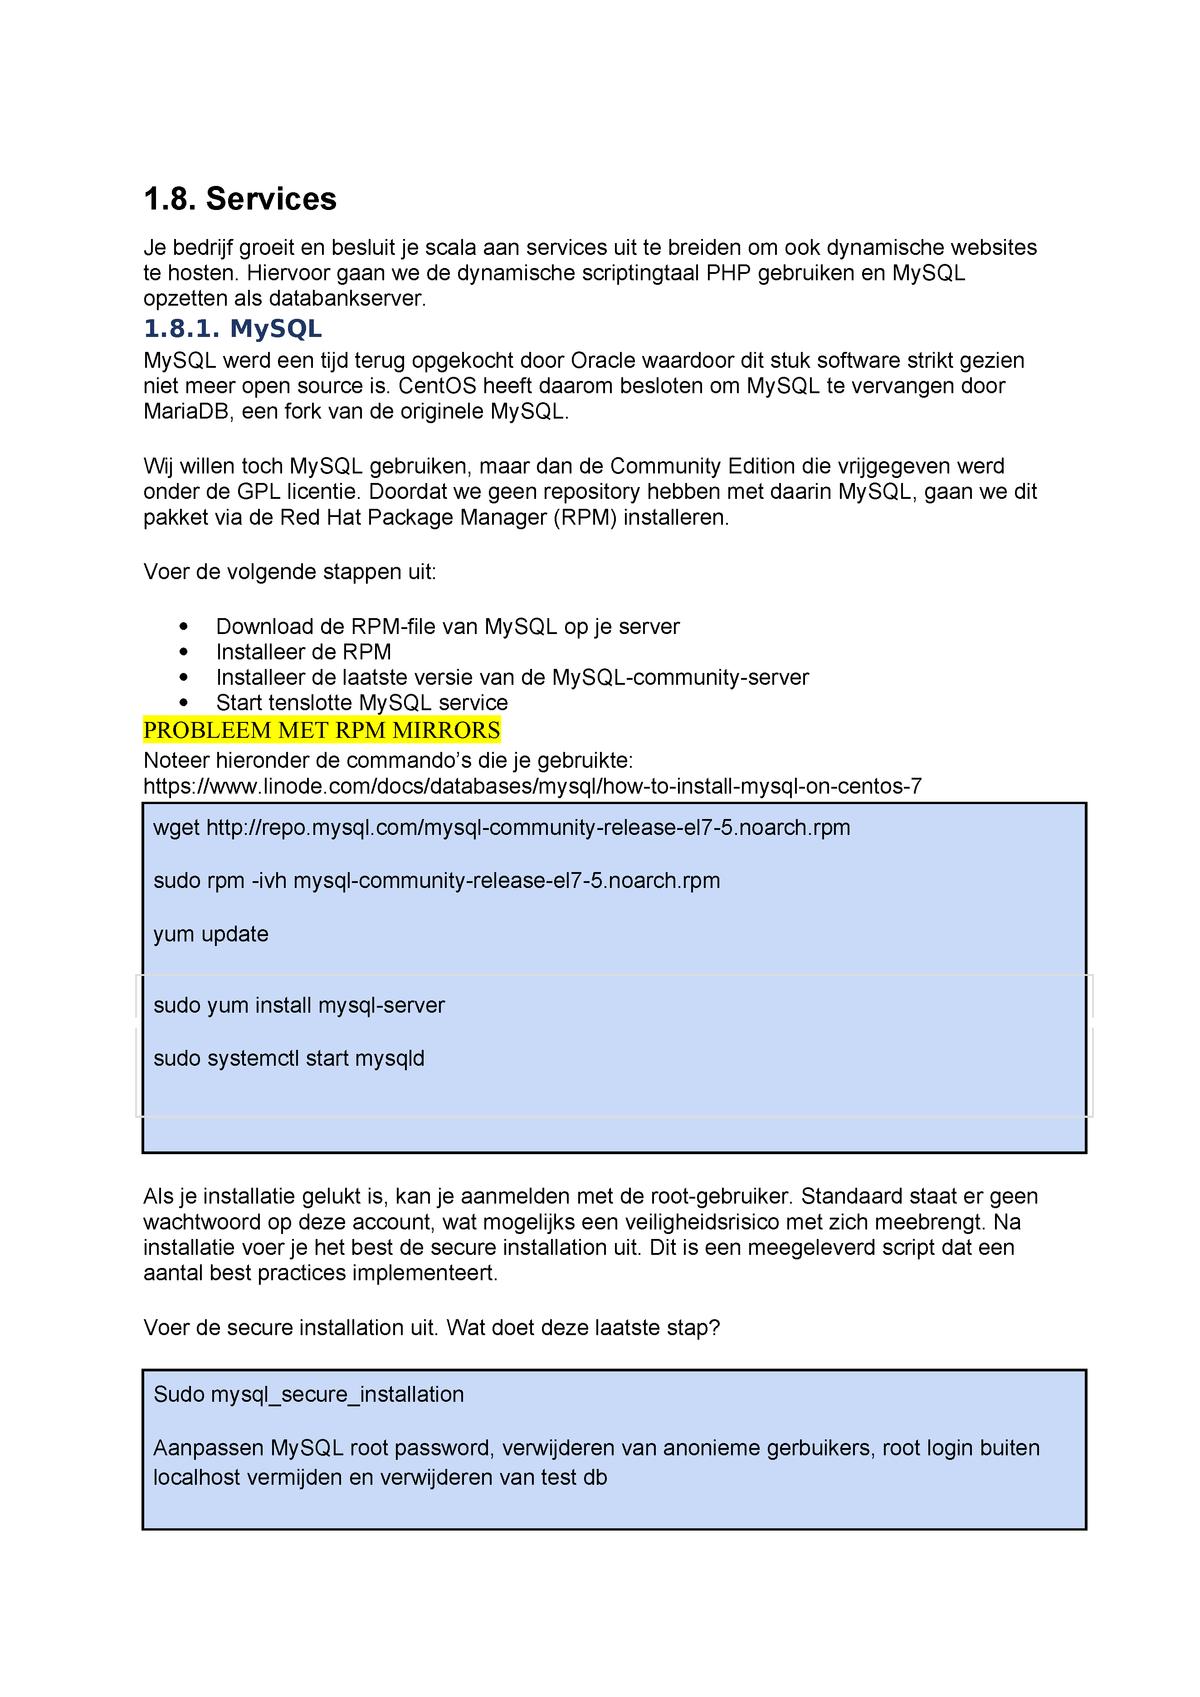 Labo 8 - Services - JPW339: Server Administration - StuDocu